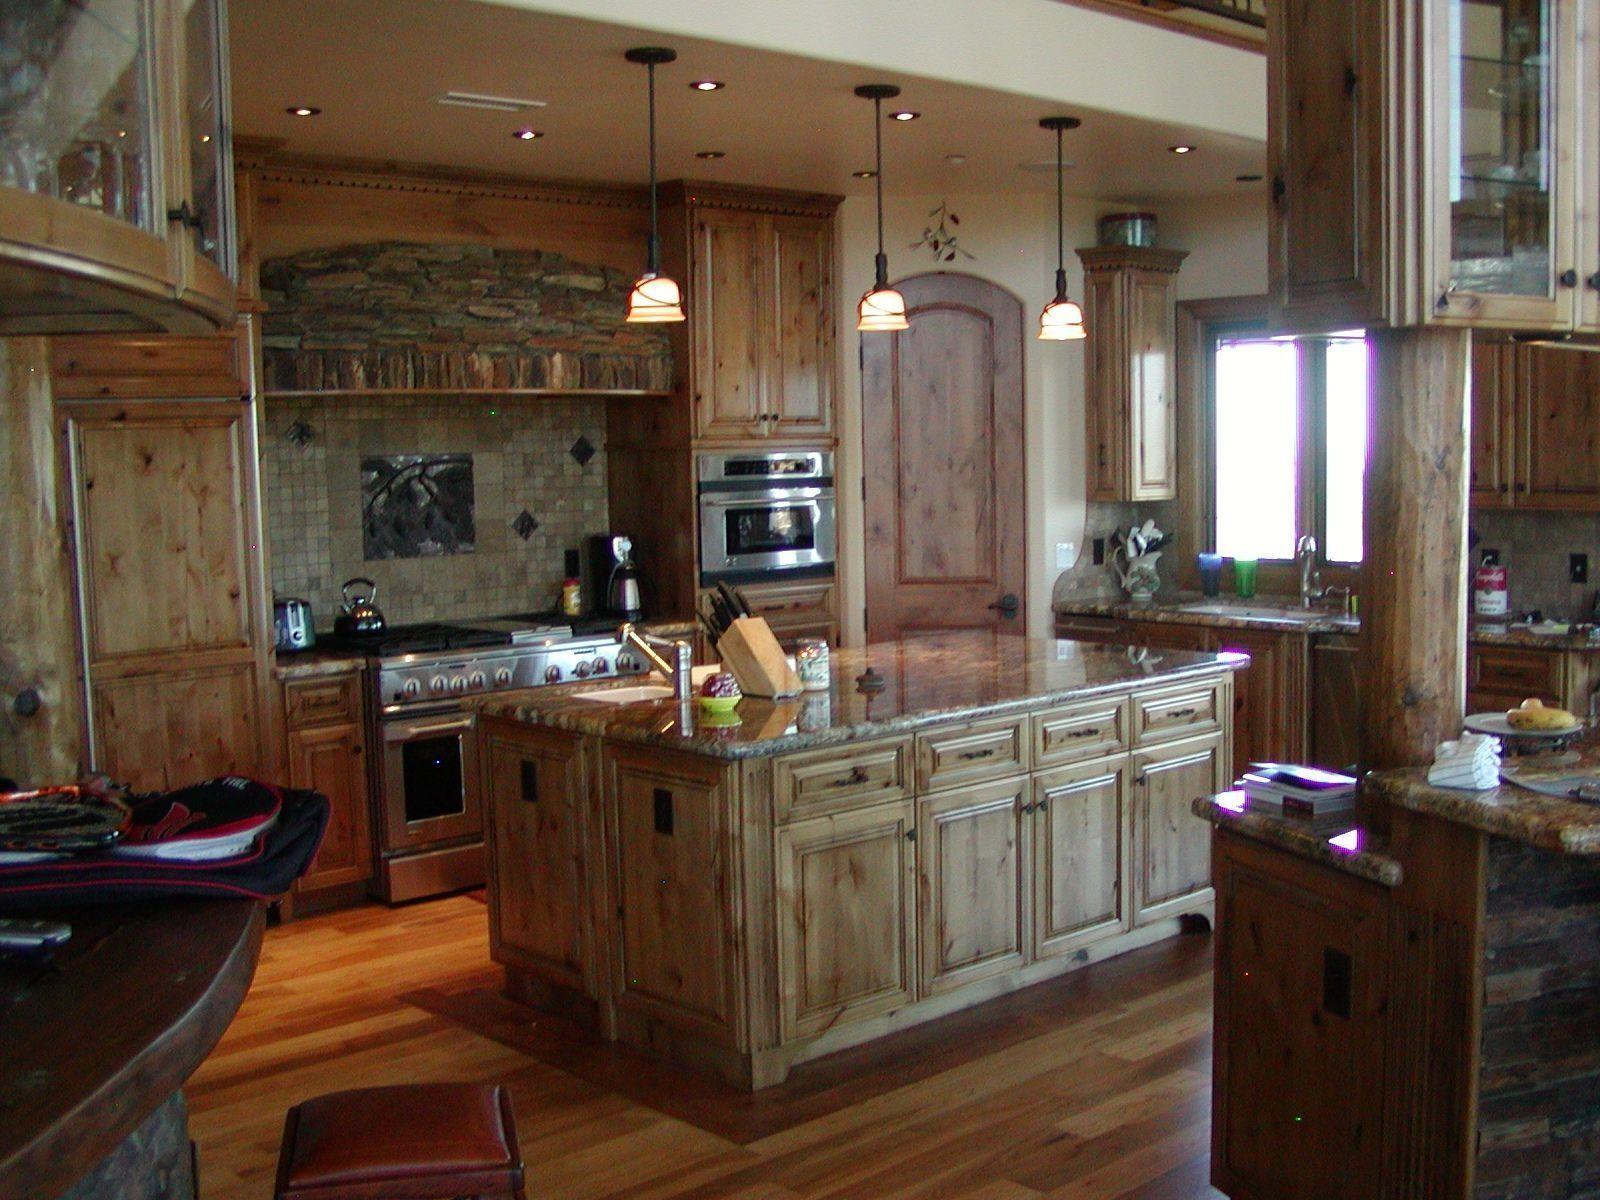 knotty alder kitchen cabinets solid wood construction rh pinterest com knotty alder kitchen cabinets solid wood construction